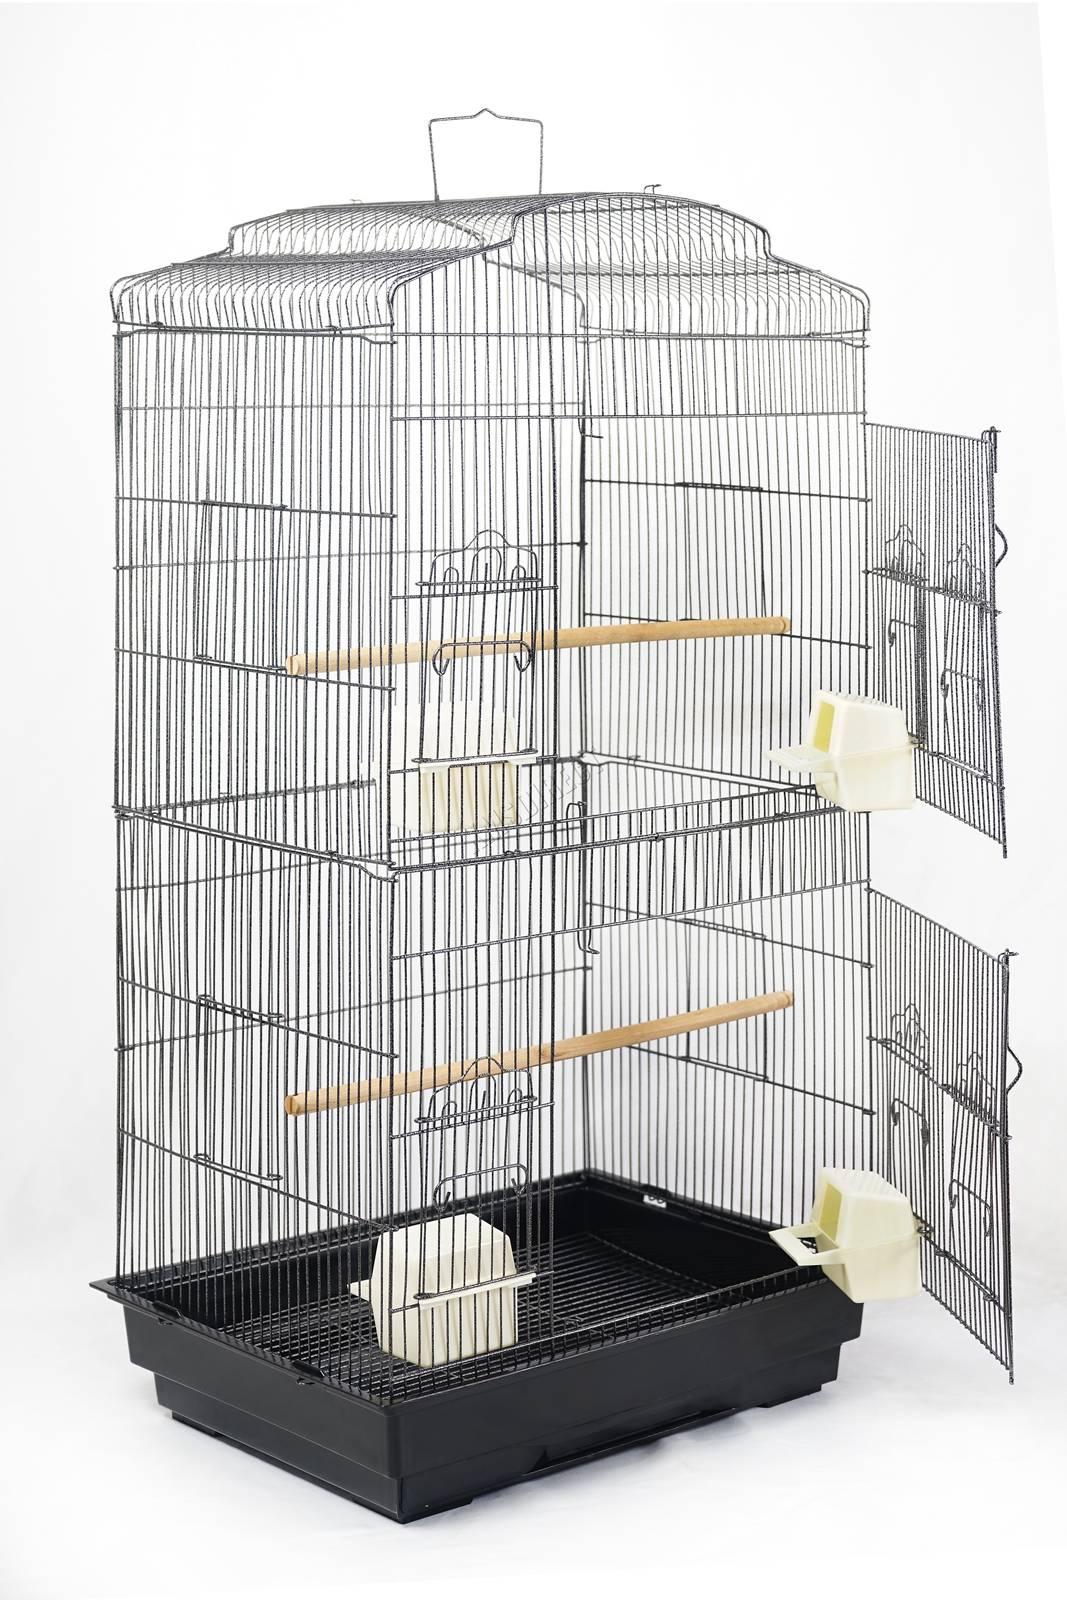 BIRD CAGE METAL MBC 05 HAMMERED SILVER KMSWM04 - Foxhunter Grande Metal Jaula con Soporte Pajarera Loro Periquito Canario Cacatua